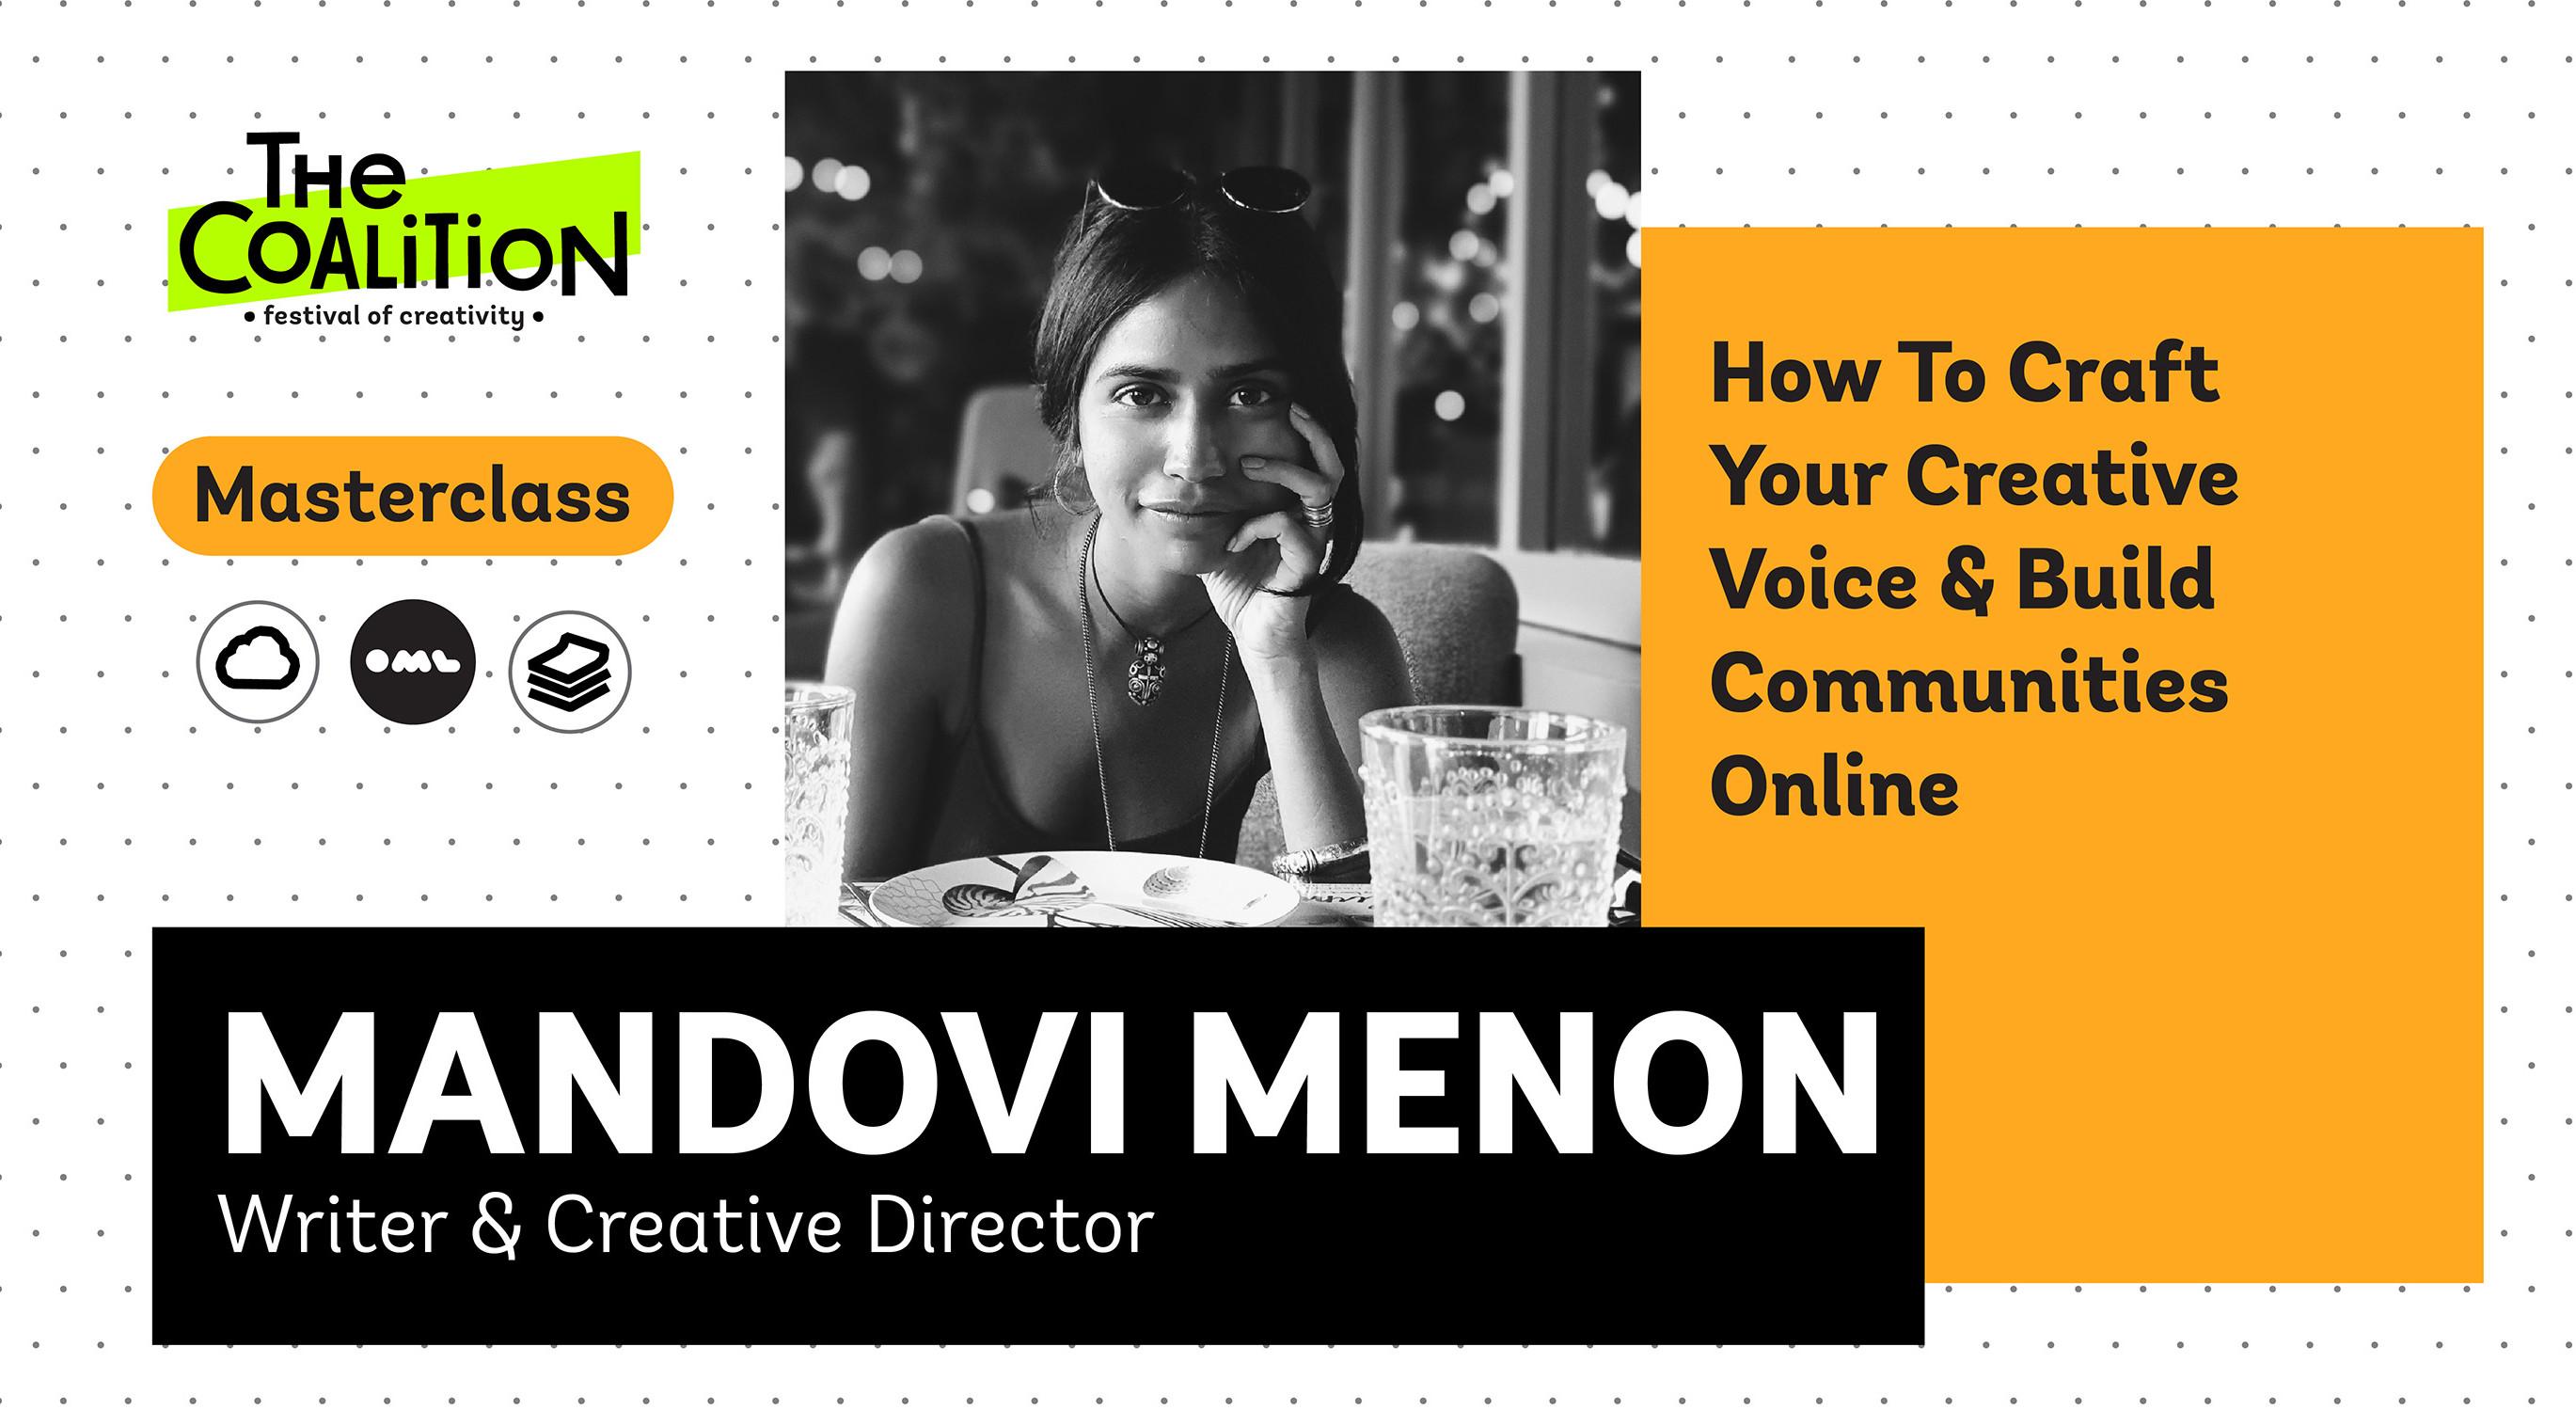 TC Masterclass: How To Craft Your Creative Voice & Build Communities Online with Mandovi Menon